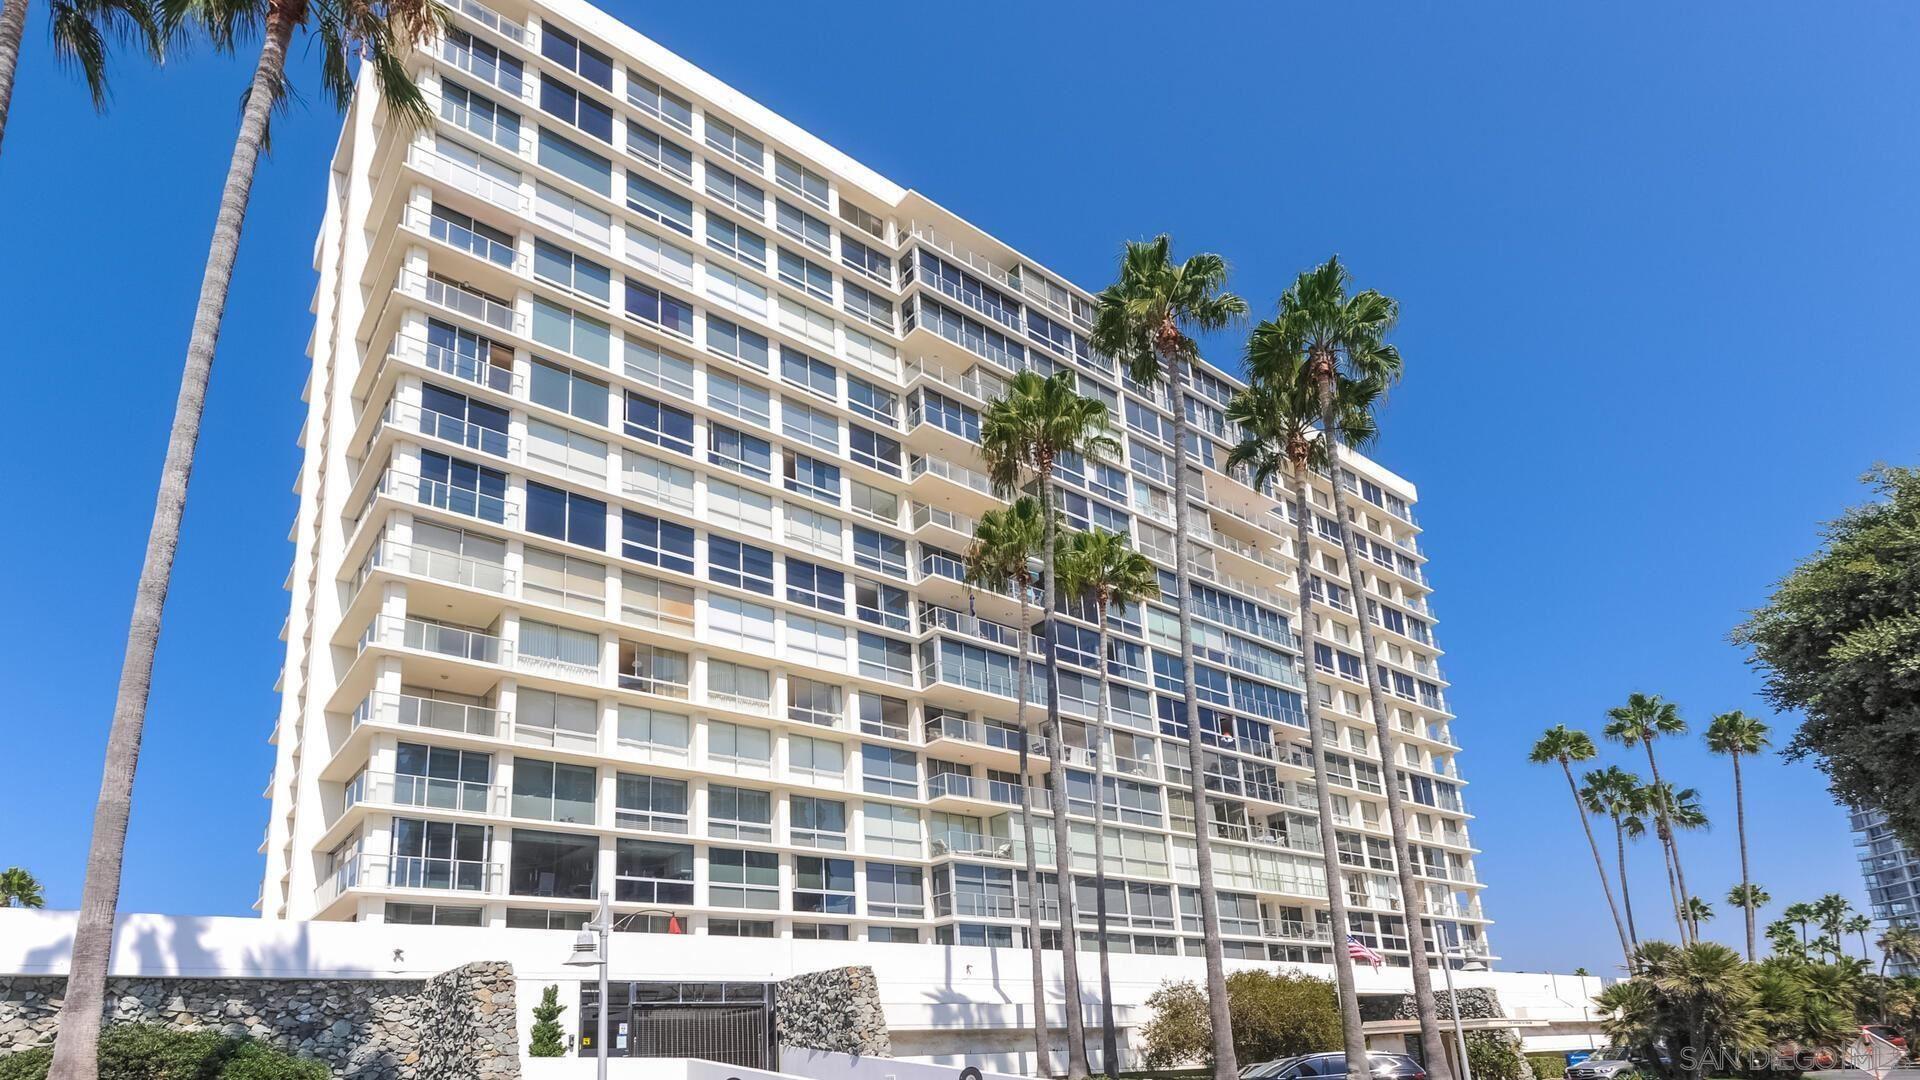 Photo of 1710 Avenida del Mundo #1407, Coronado, CA 92118 (MLS # 210020834)